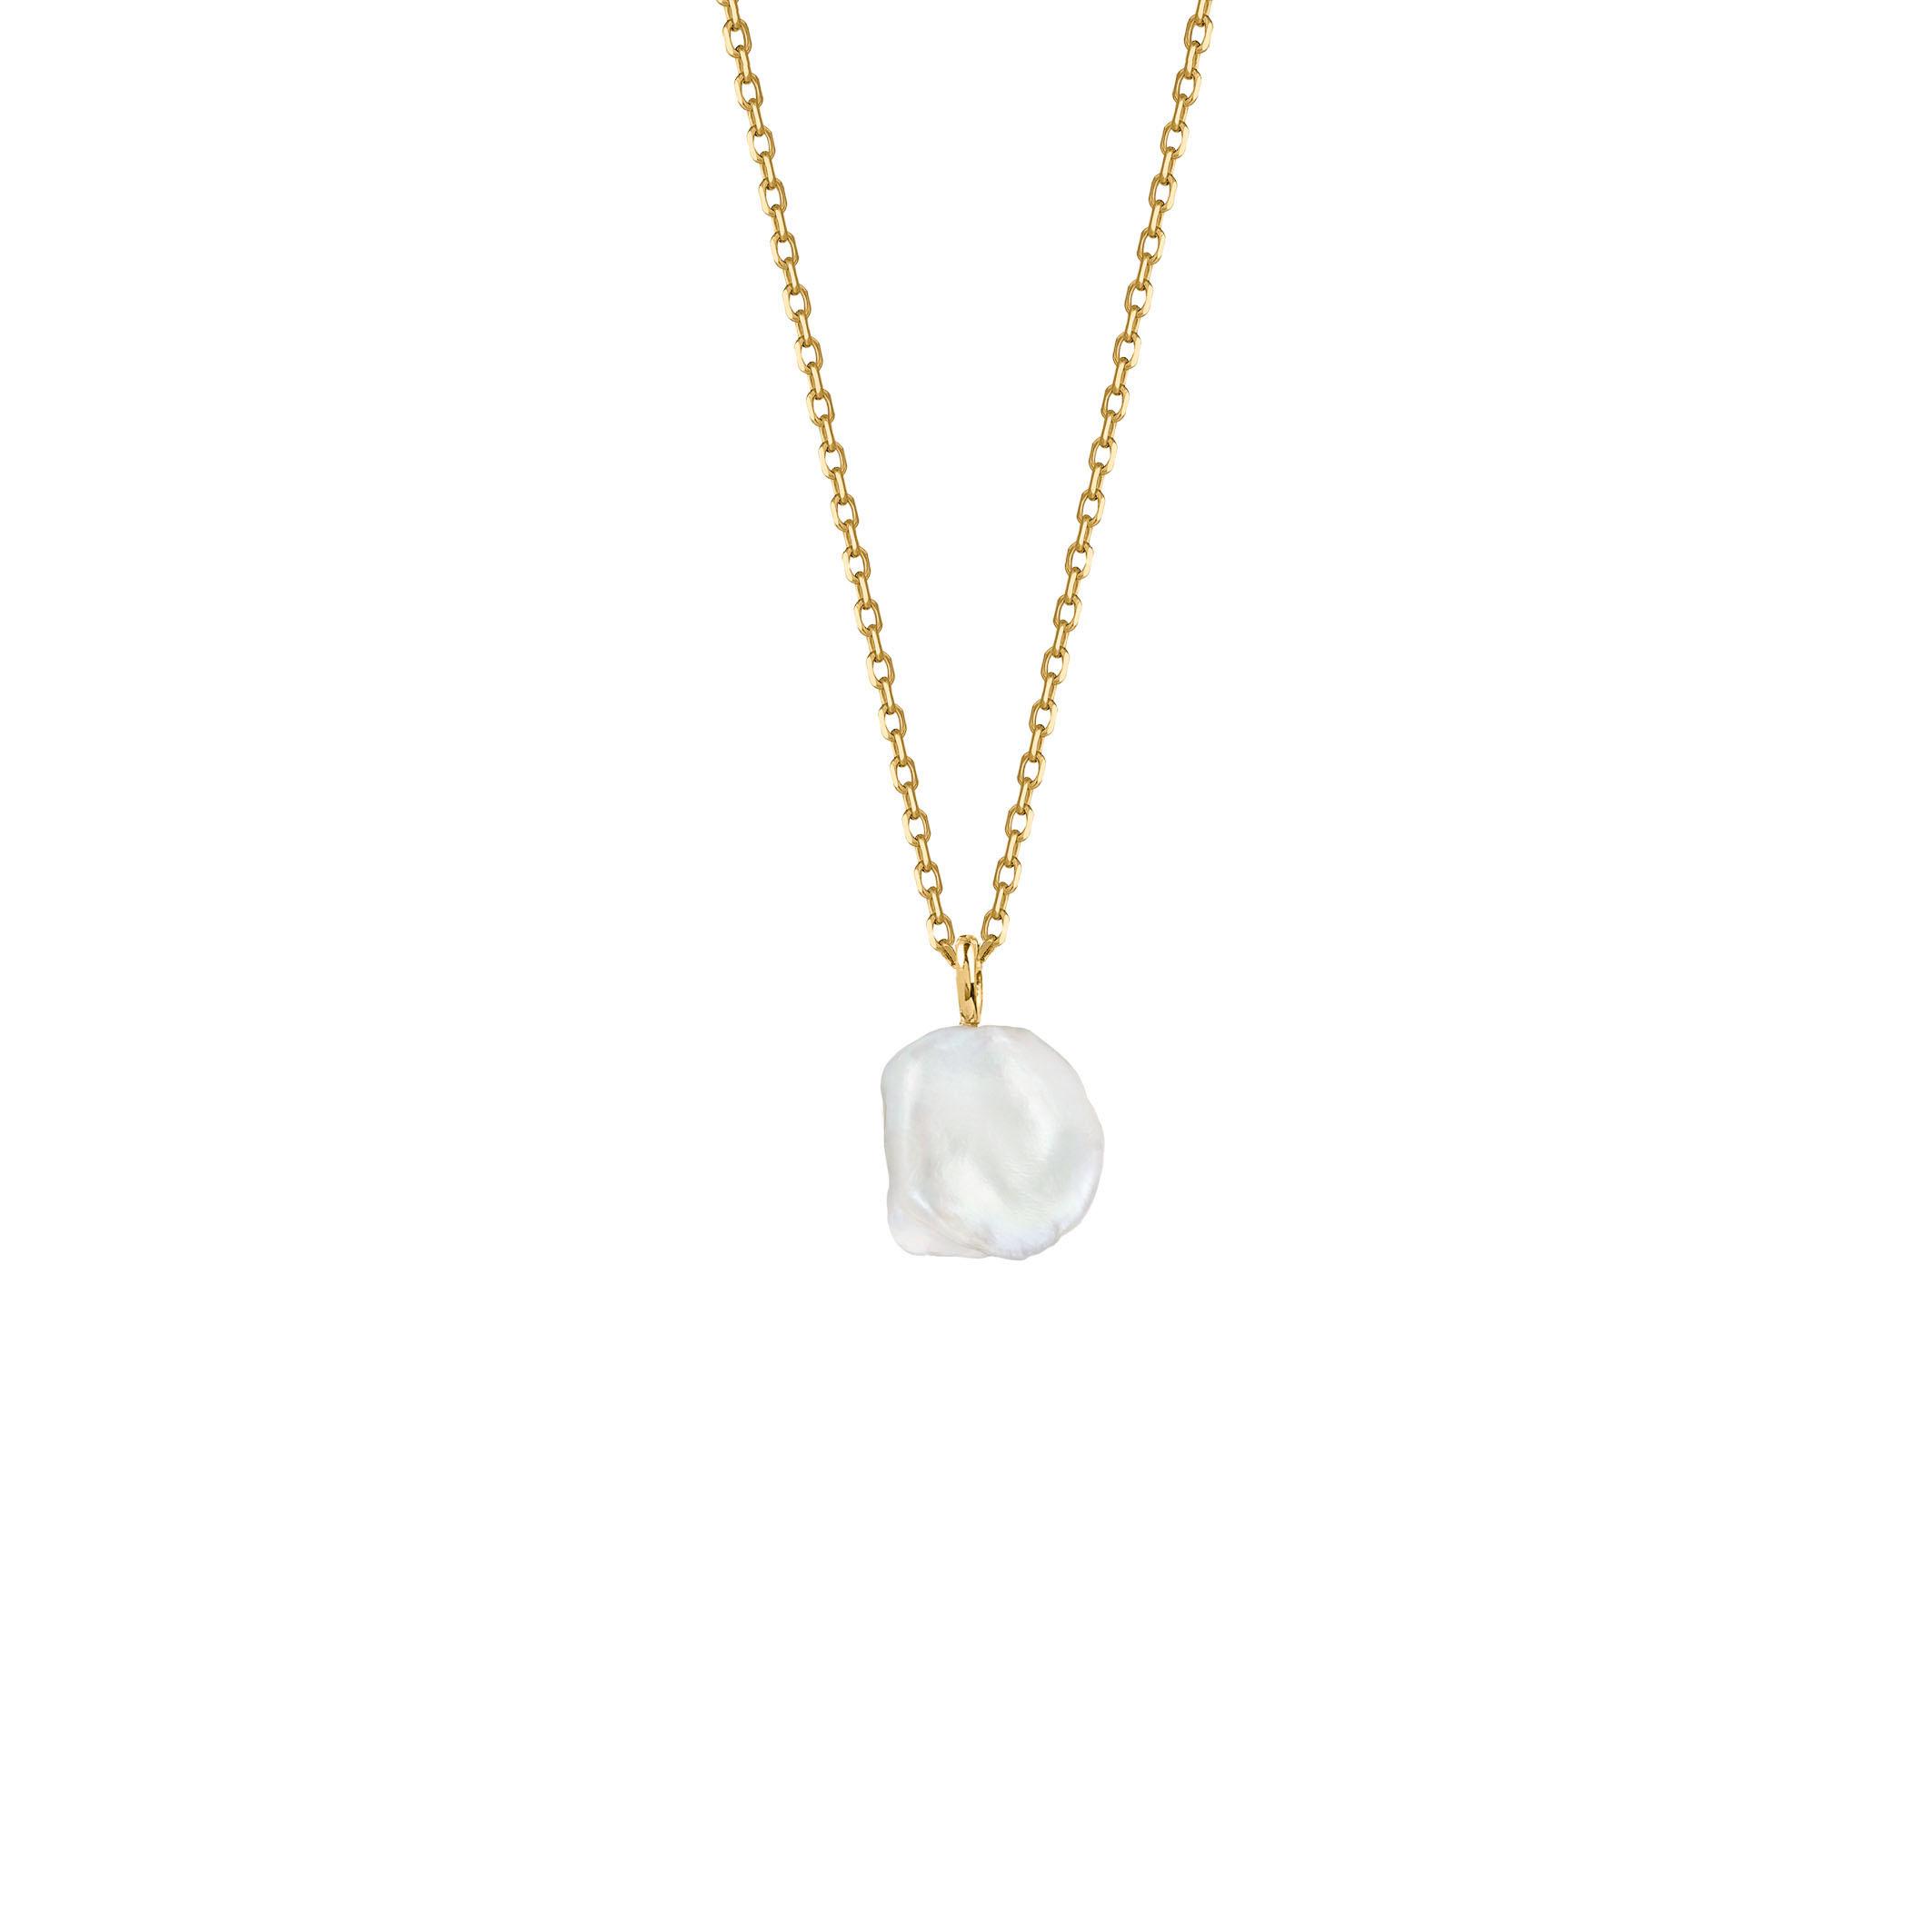 Medium Pearl Necklace